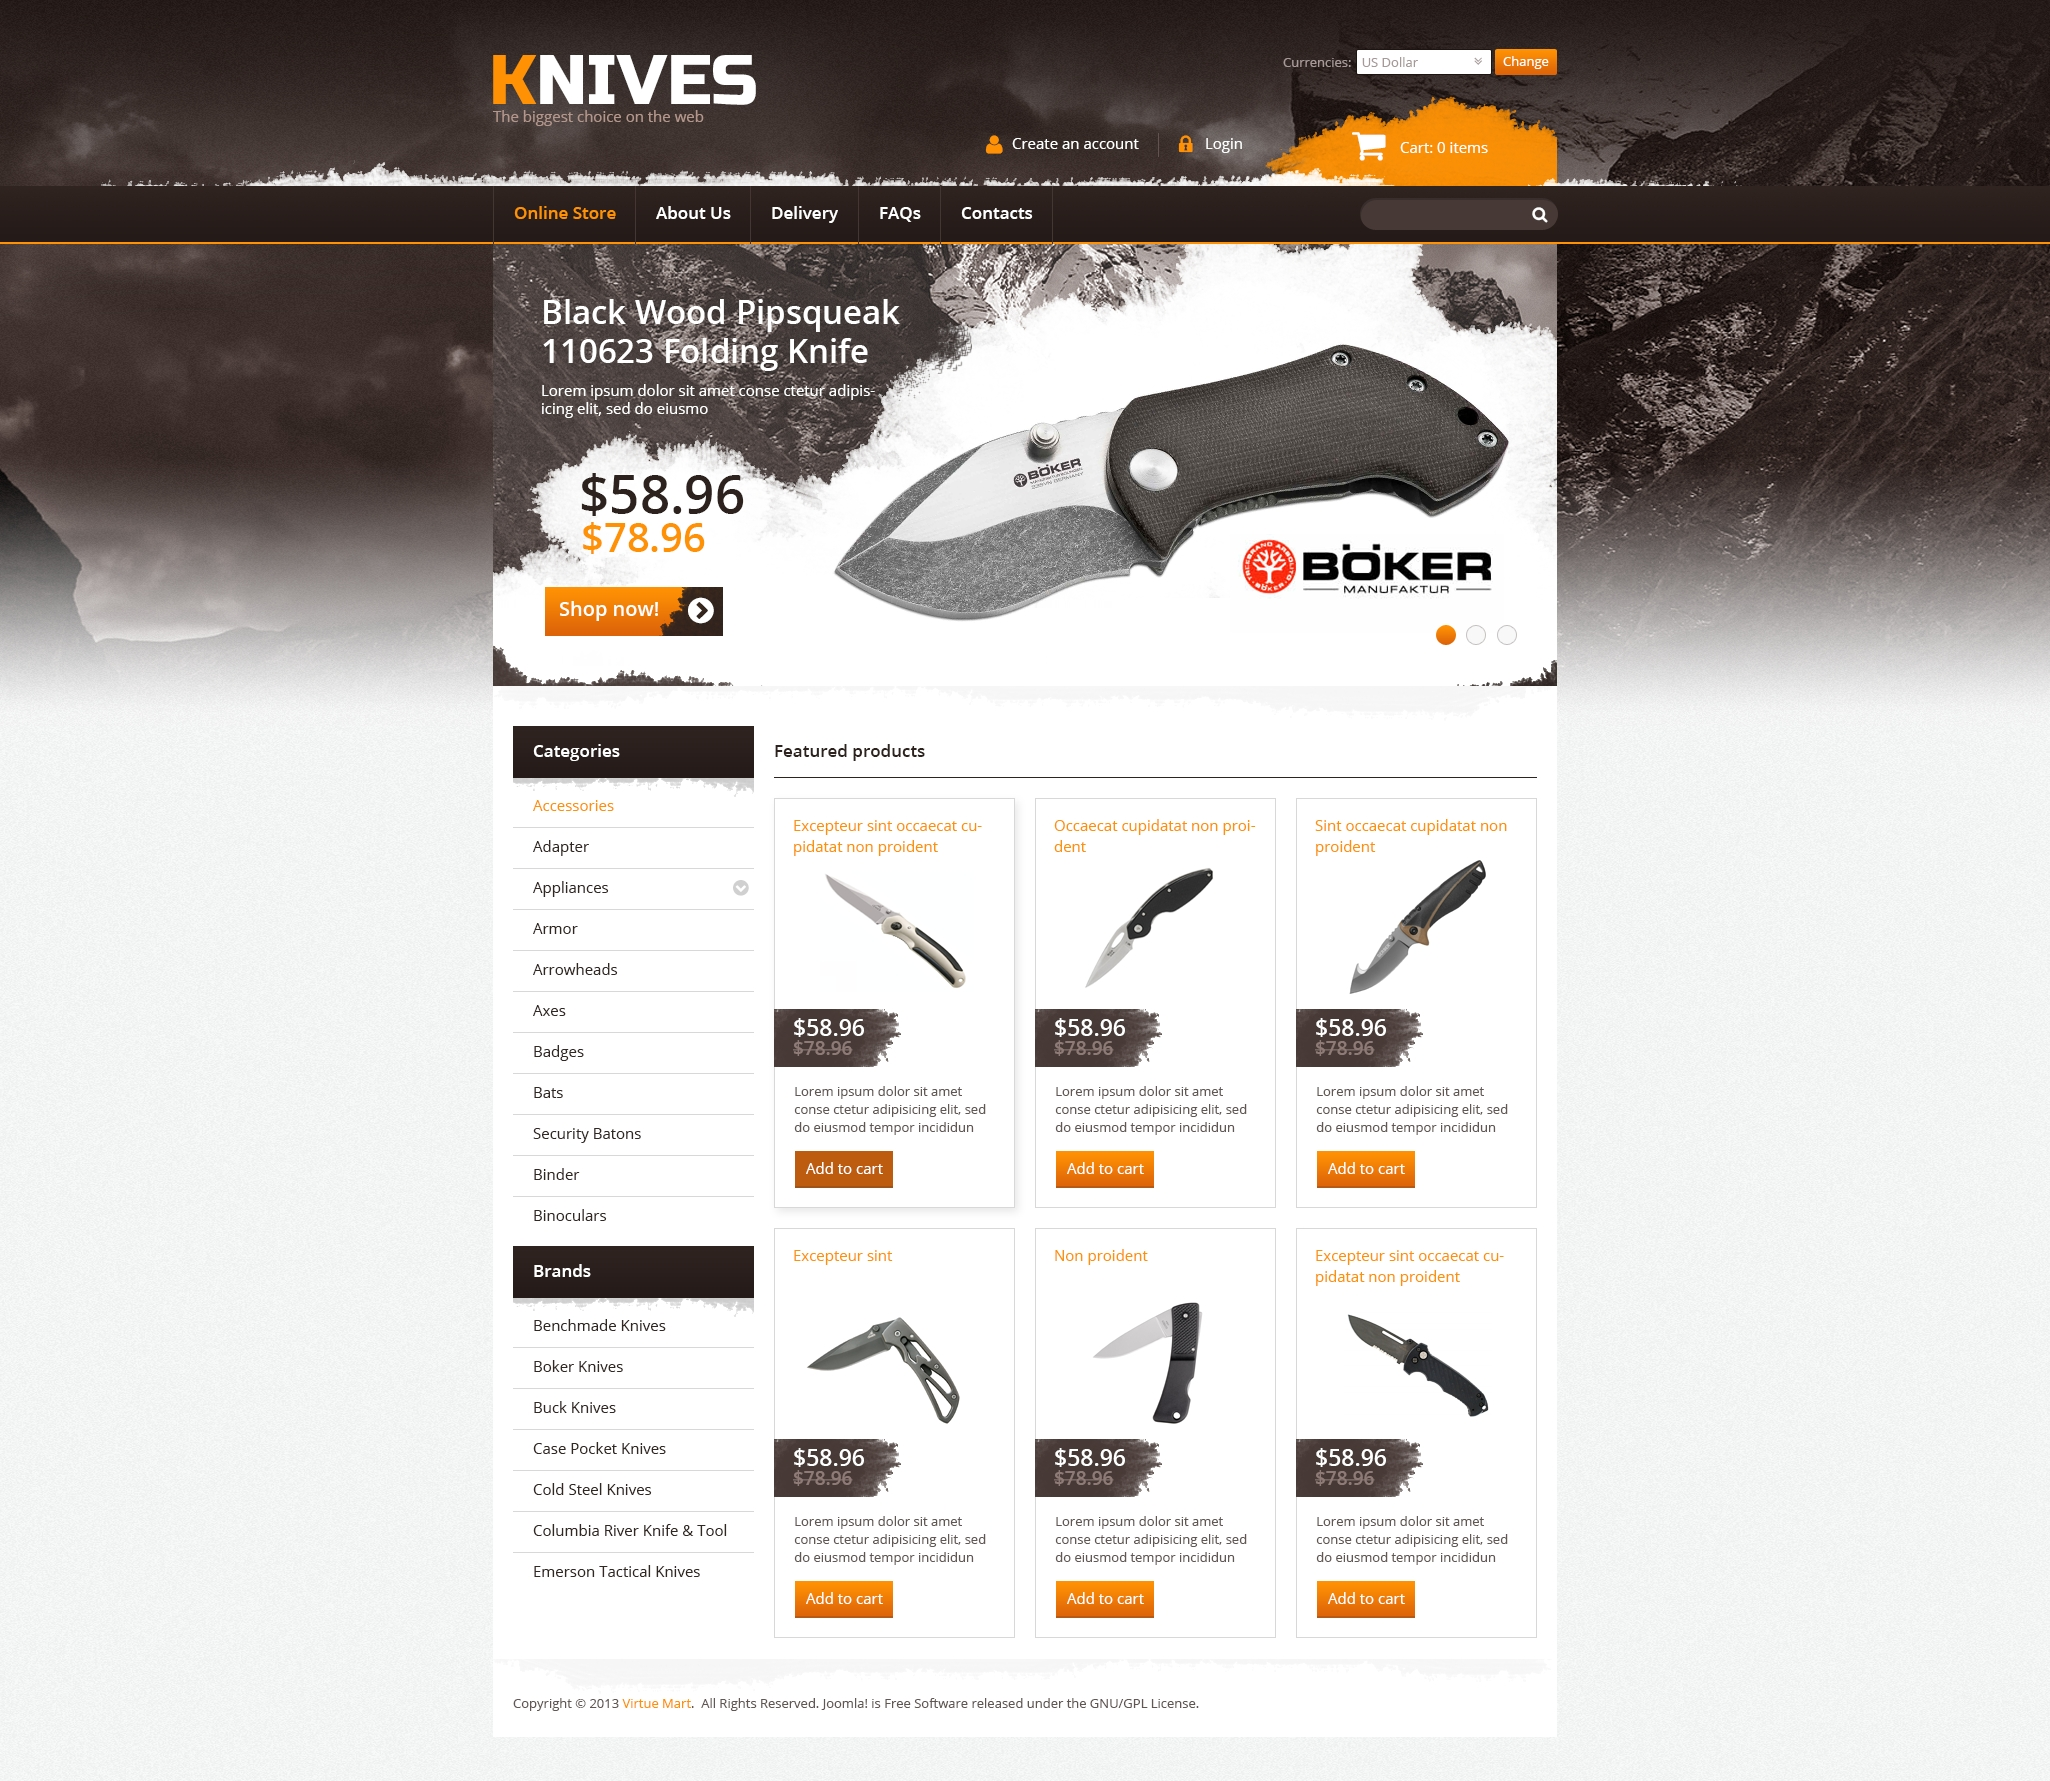 Knives on the Web VirtueMart Template #45721